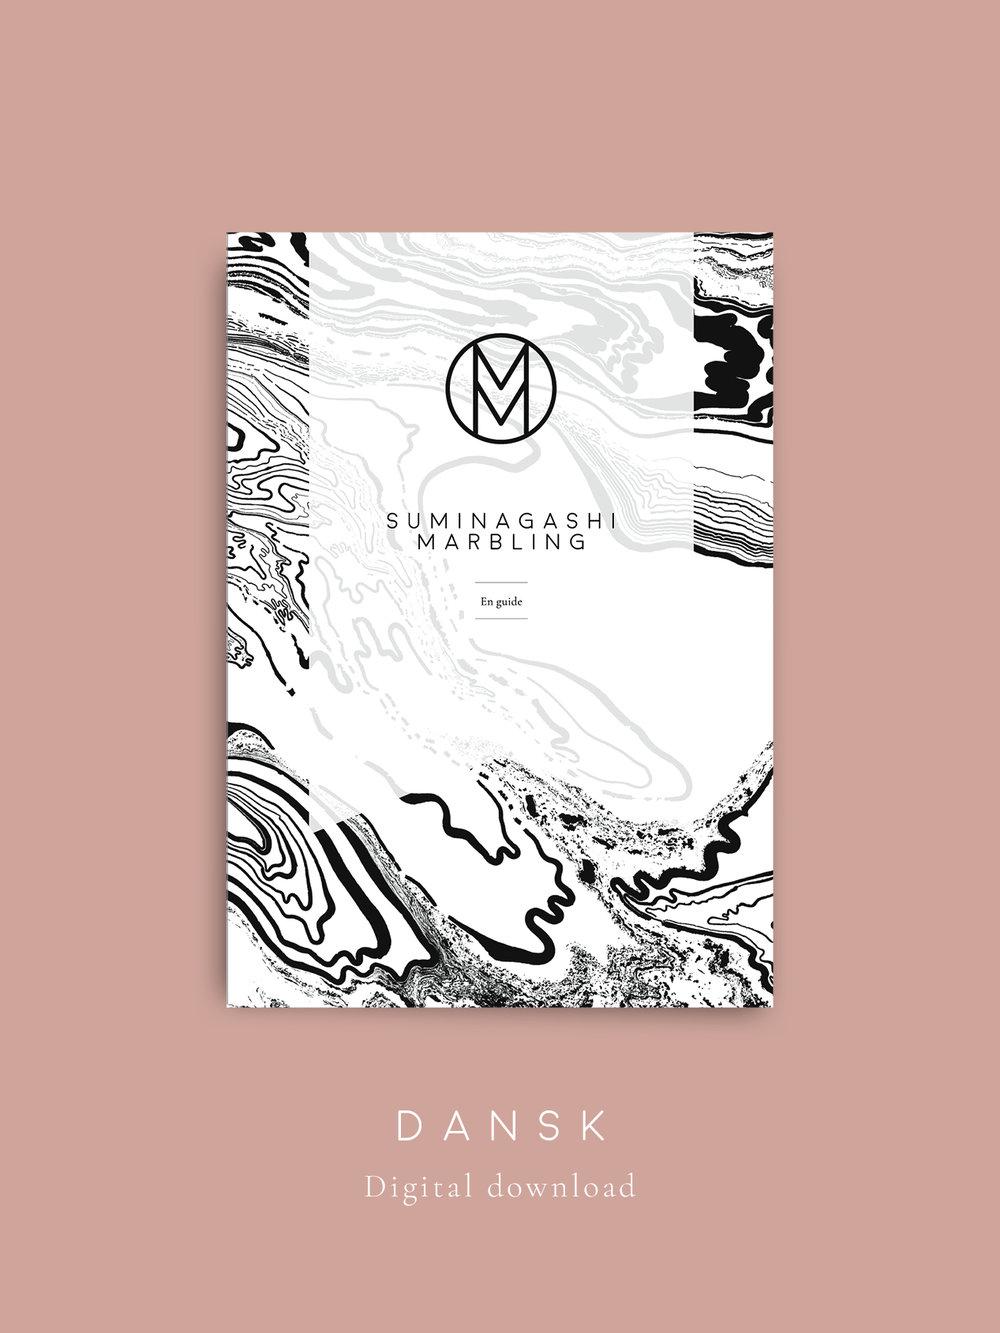 Manual_Sumi_Dansk.jpg